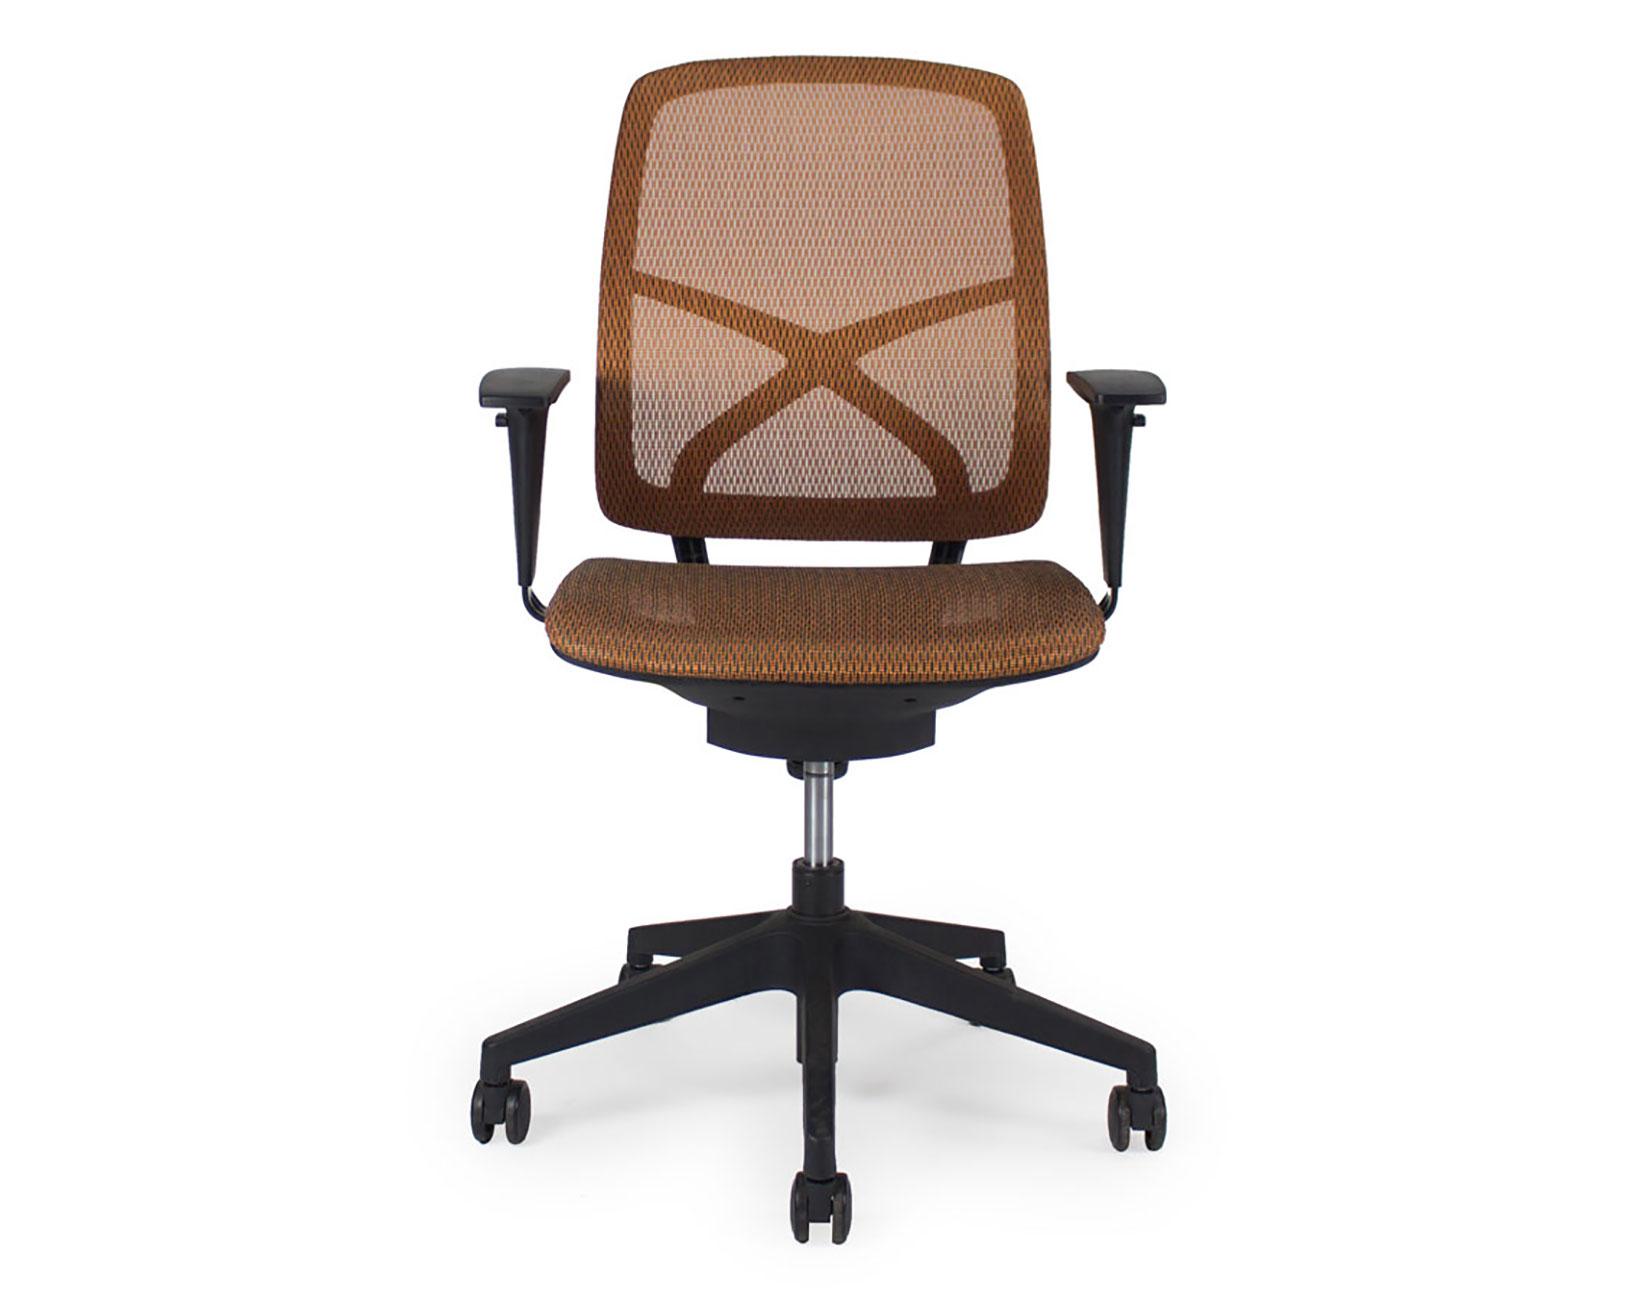 Pixel Chair Orange Office Furniture Ethosource